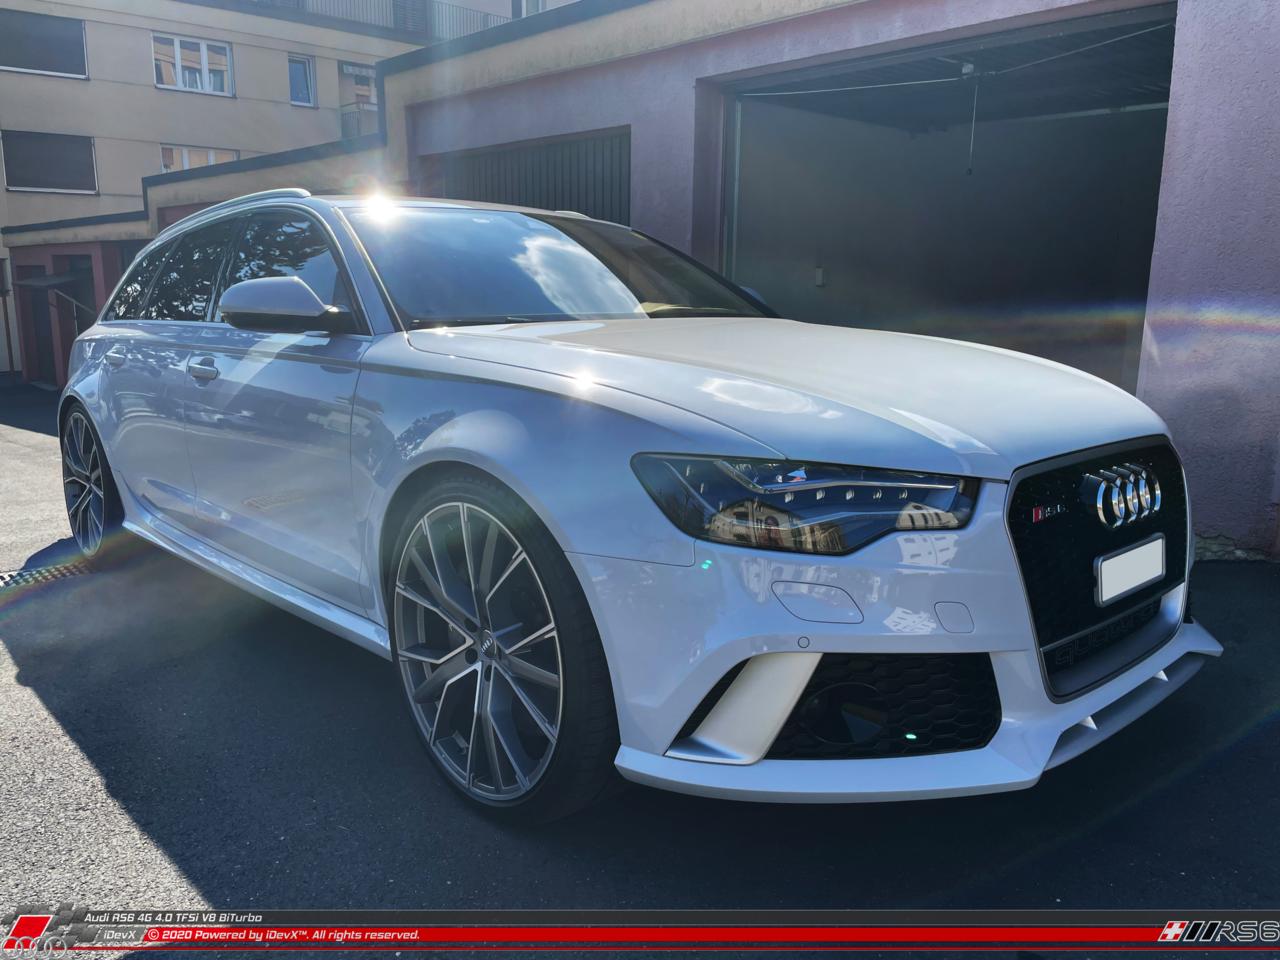 03.04.2021_Audi-RS6_iDevX_001.png